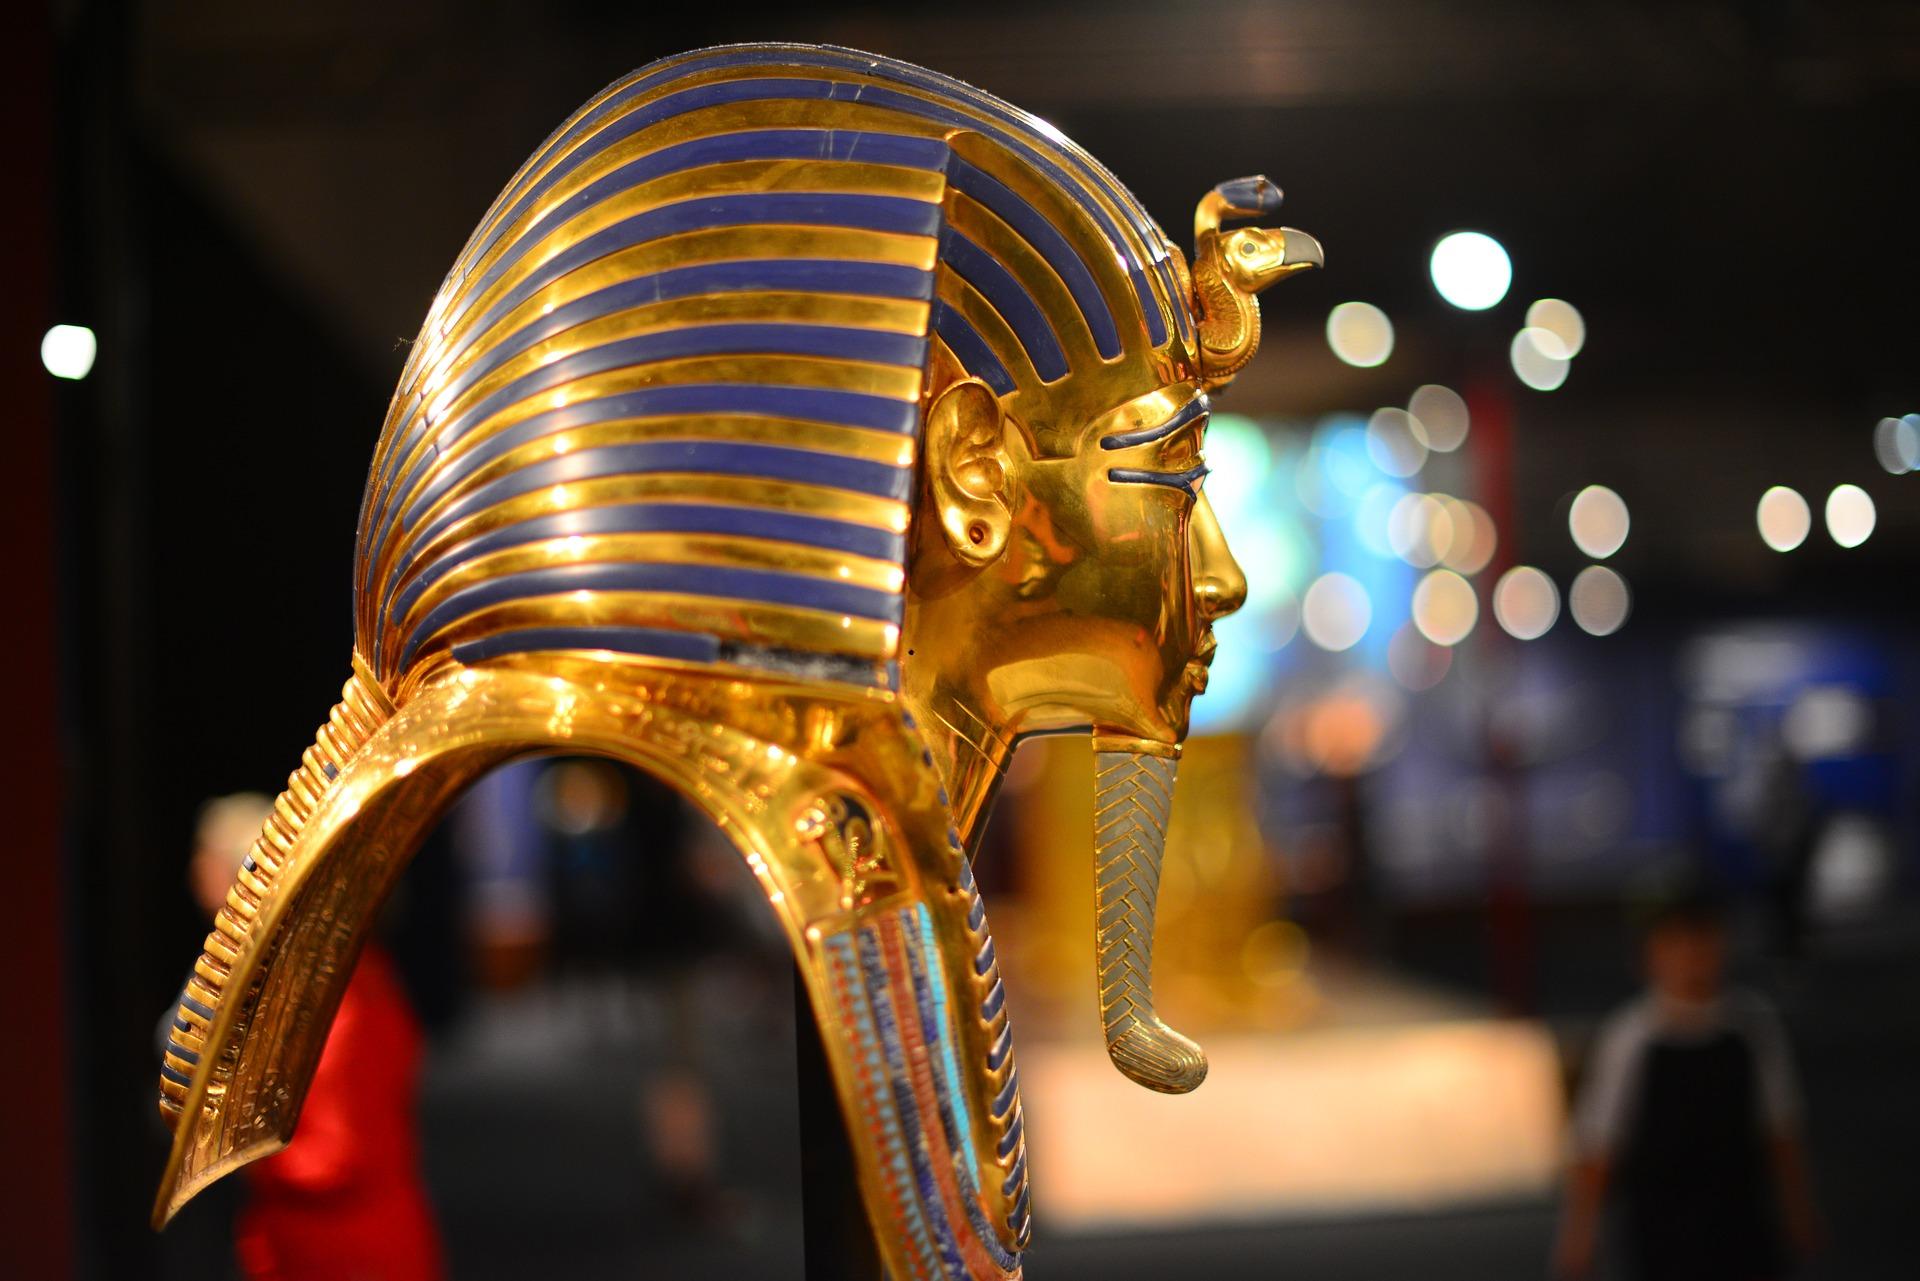 King Tutankhamun Information | King Tutankhamun Facts and Discovery